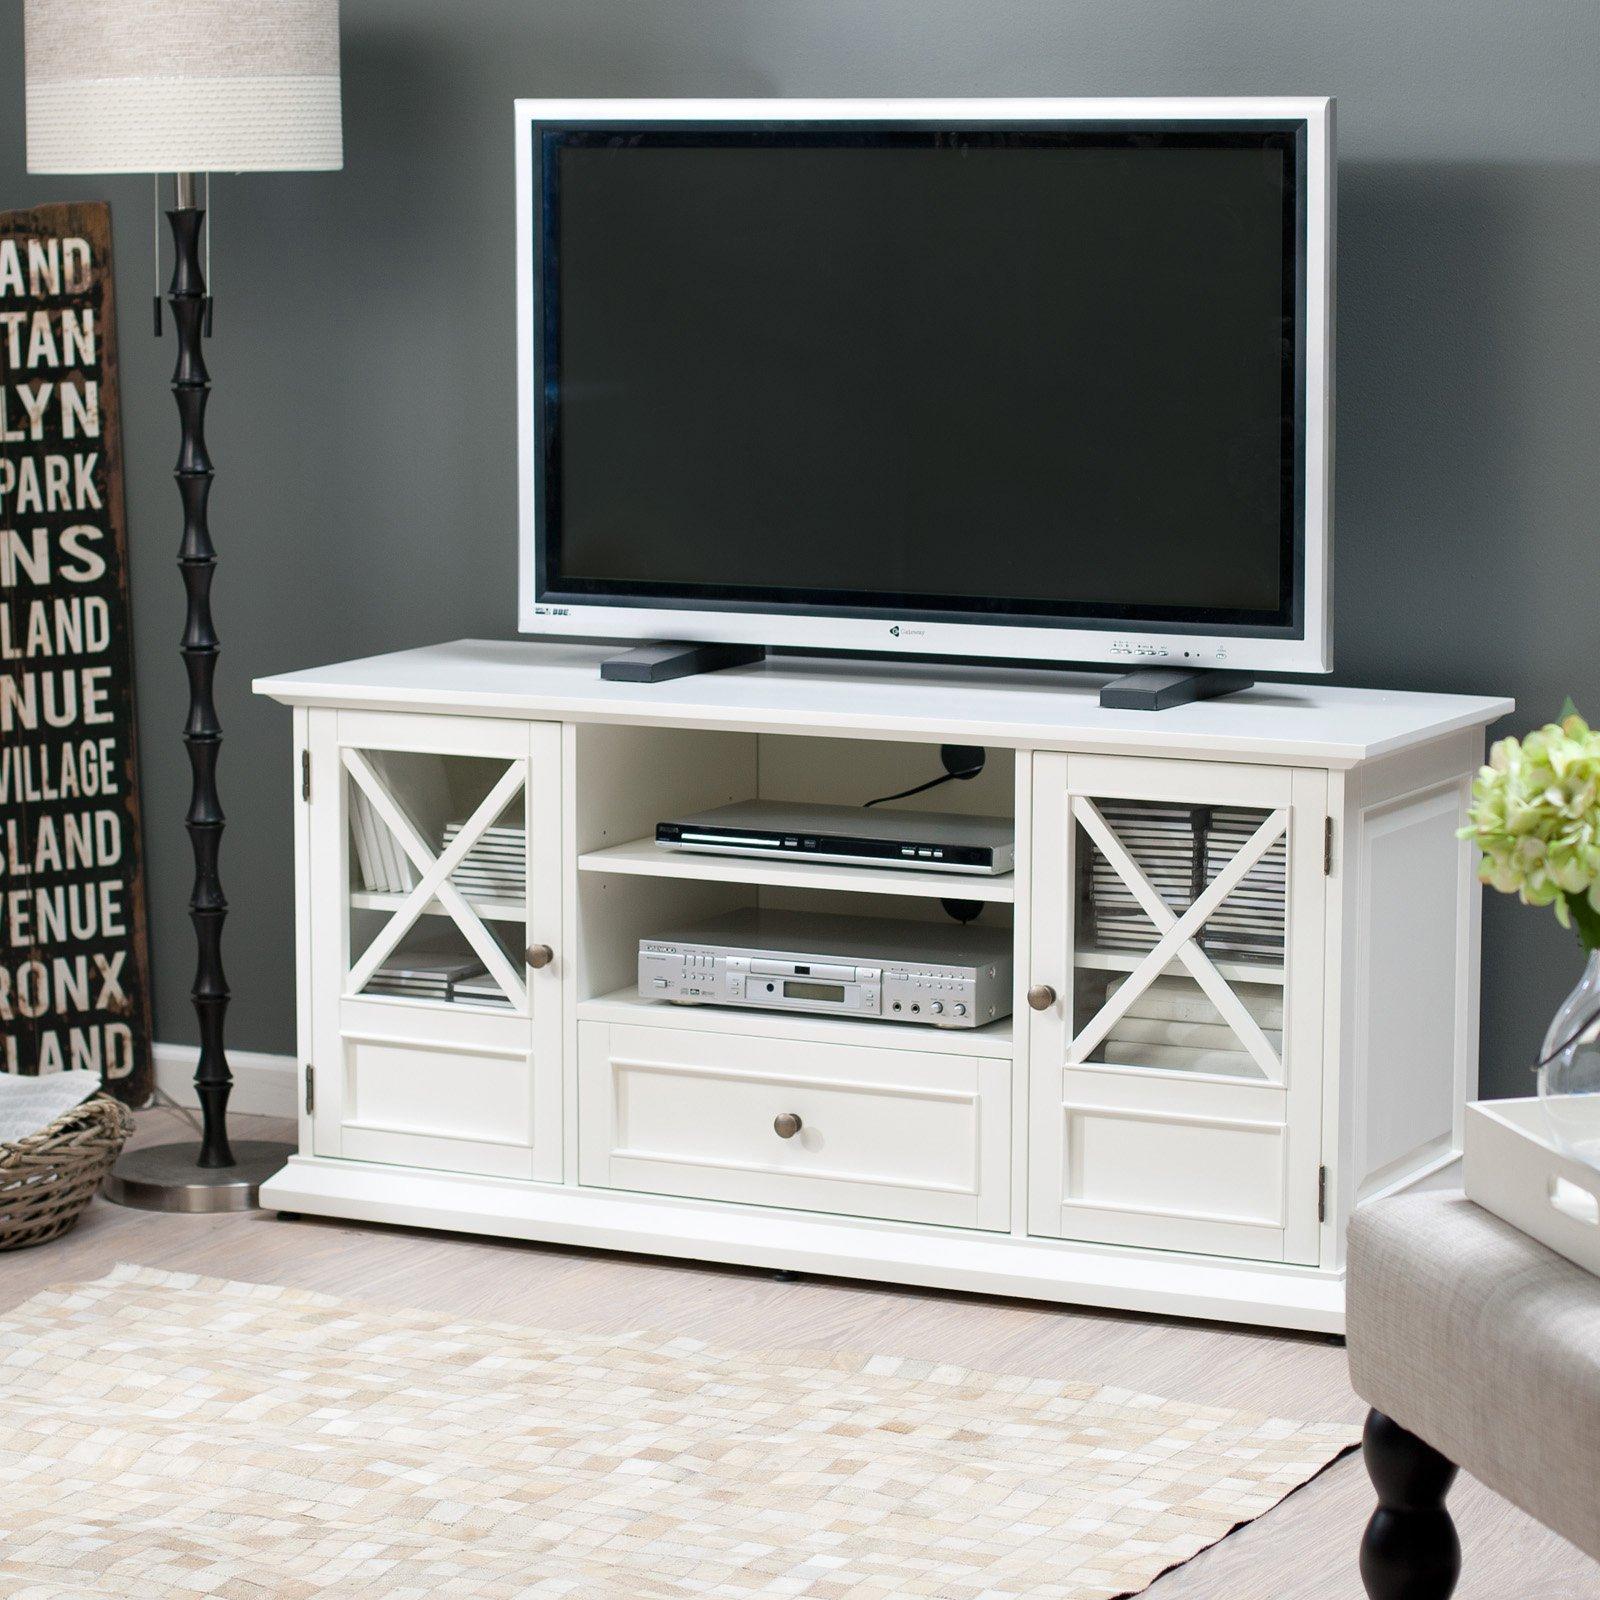 Belham Living Hampton Tv Stand - White - Walmart for Century White 60 Inch Tv Stands (Image 6 of 30)